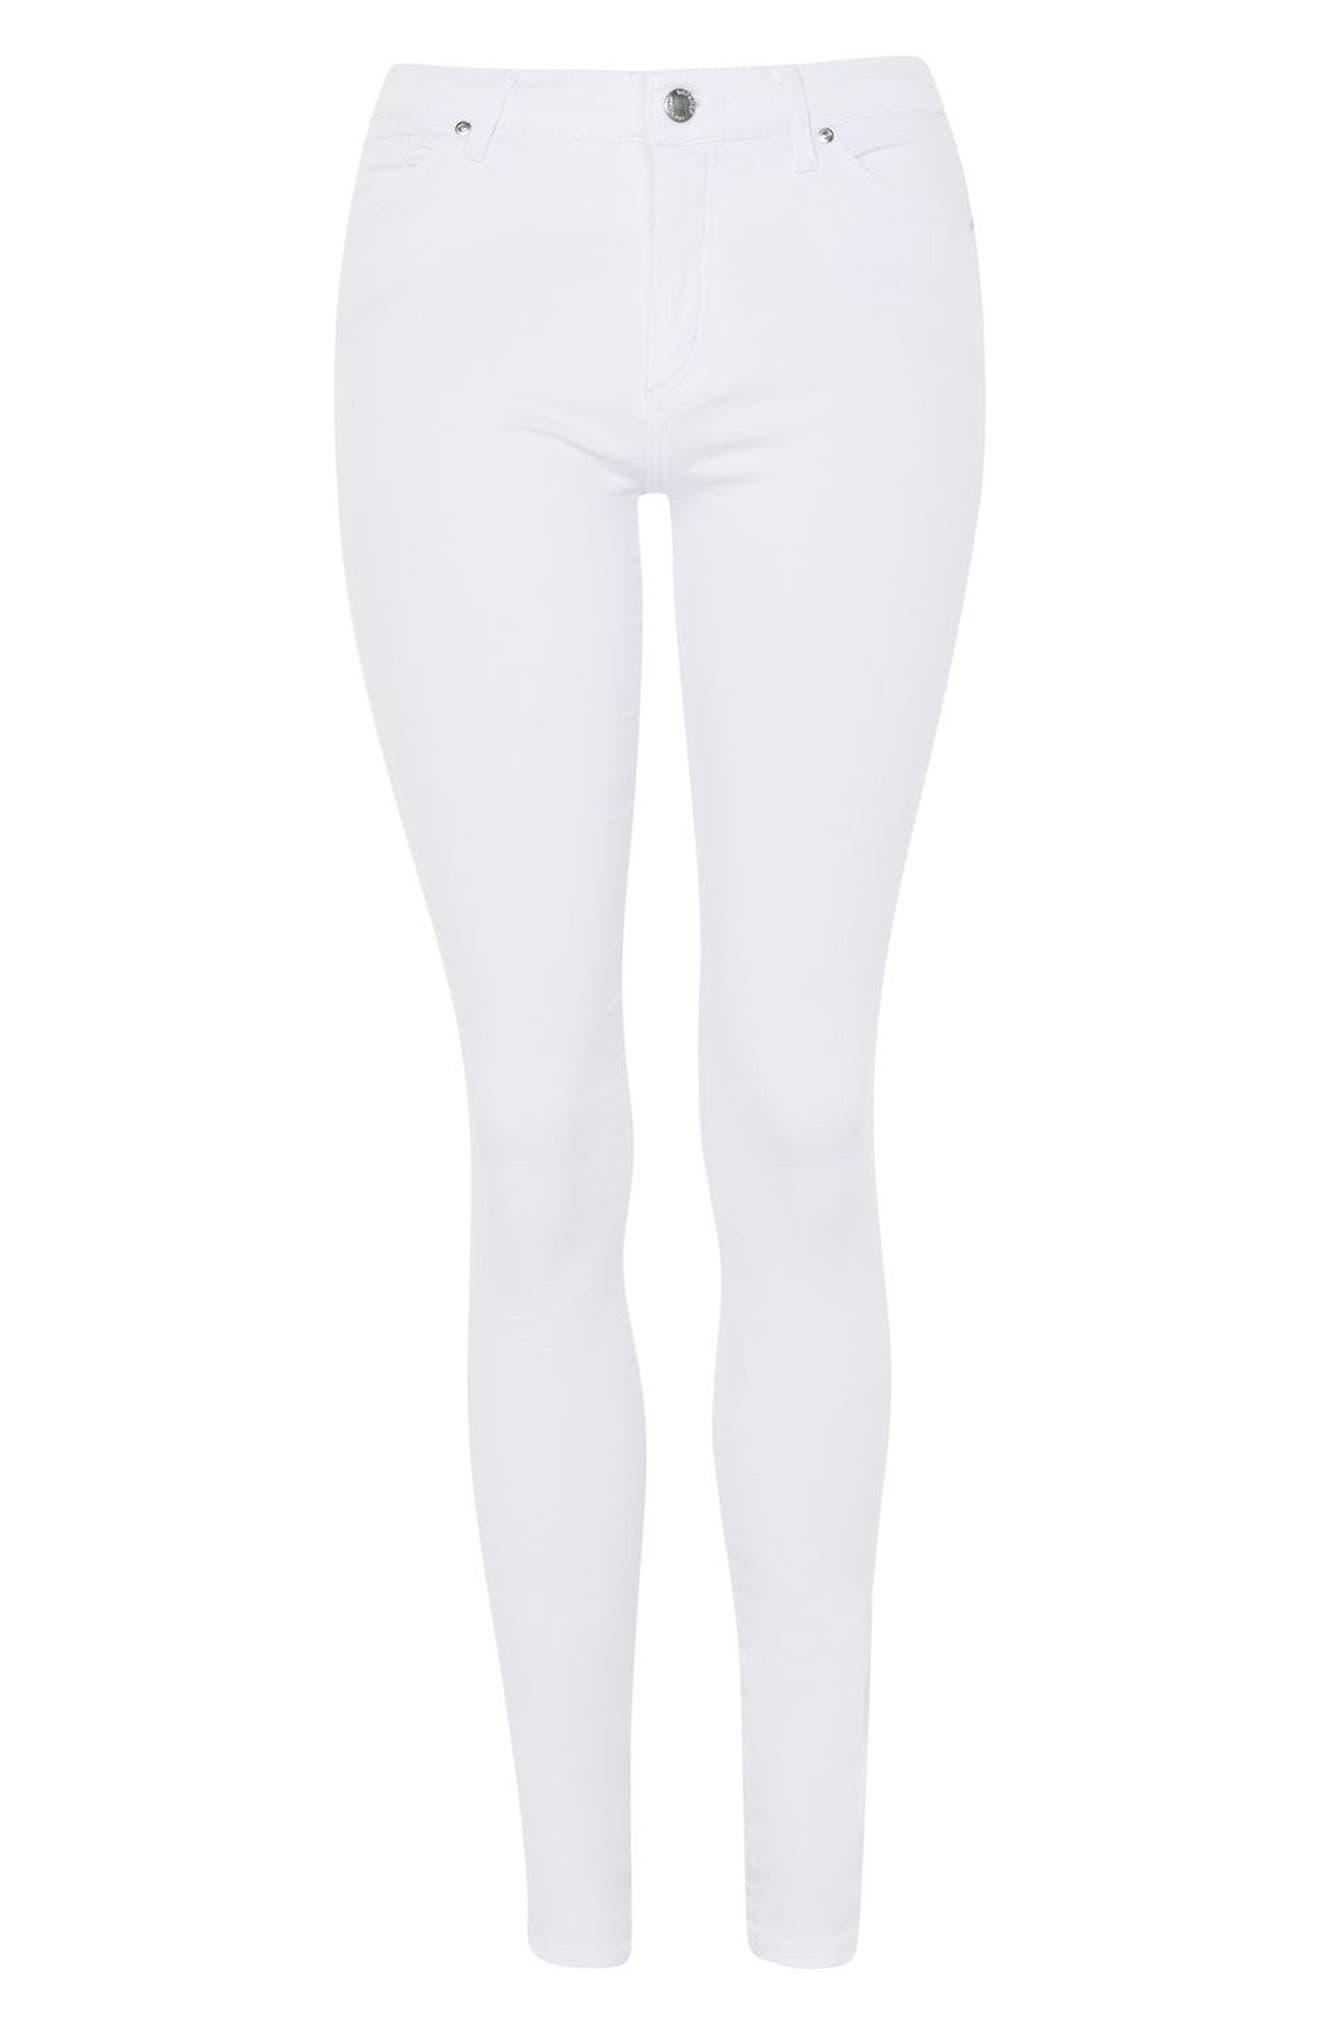 Leigh Skinny Jeans,                             Alternate thumbnail 4, color,                             White